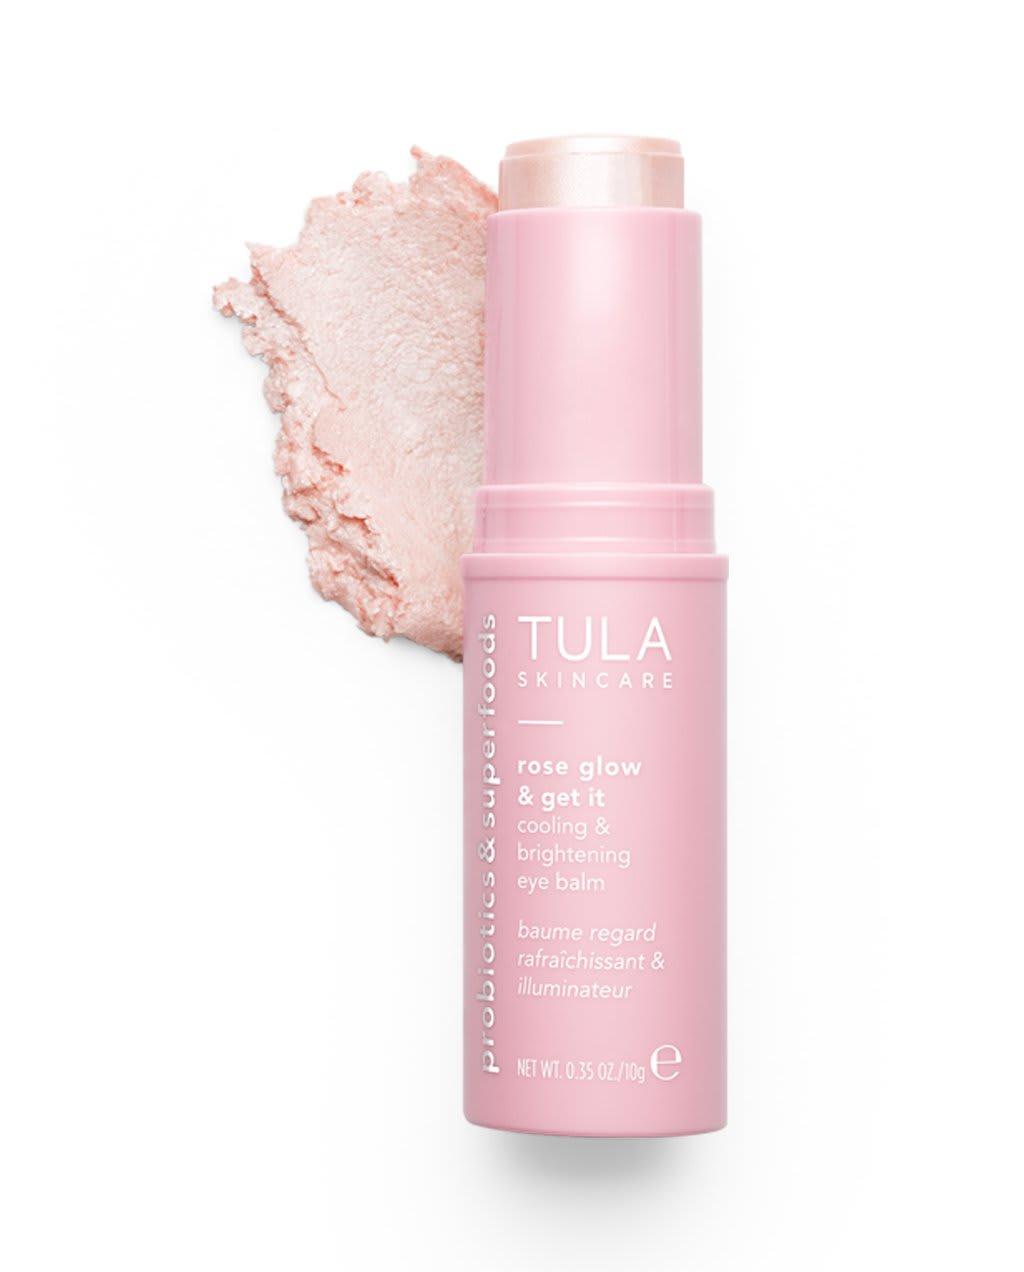 rose glow & get it | Tula Skincare